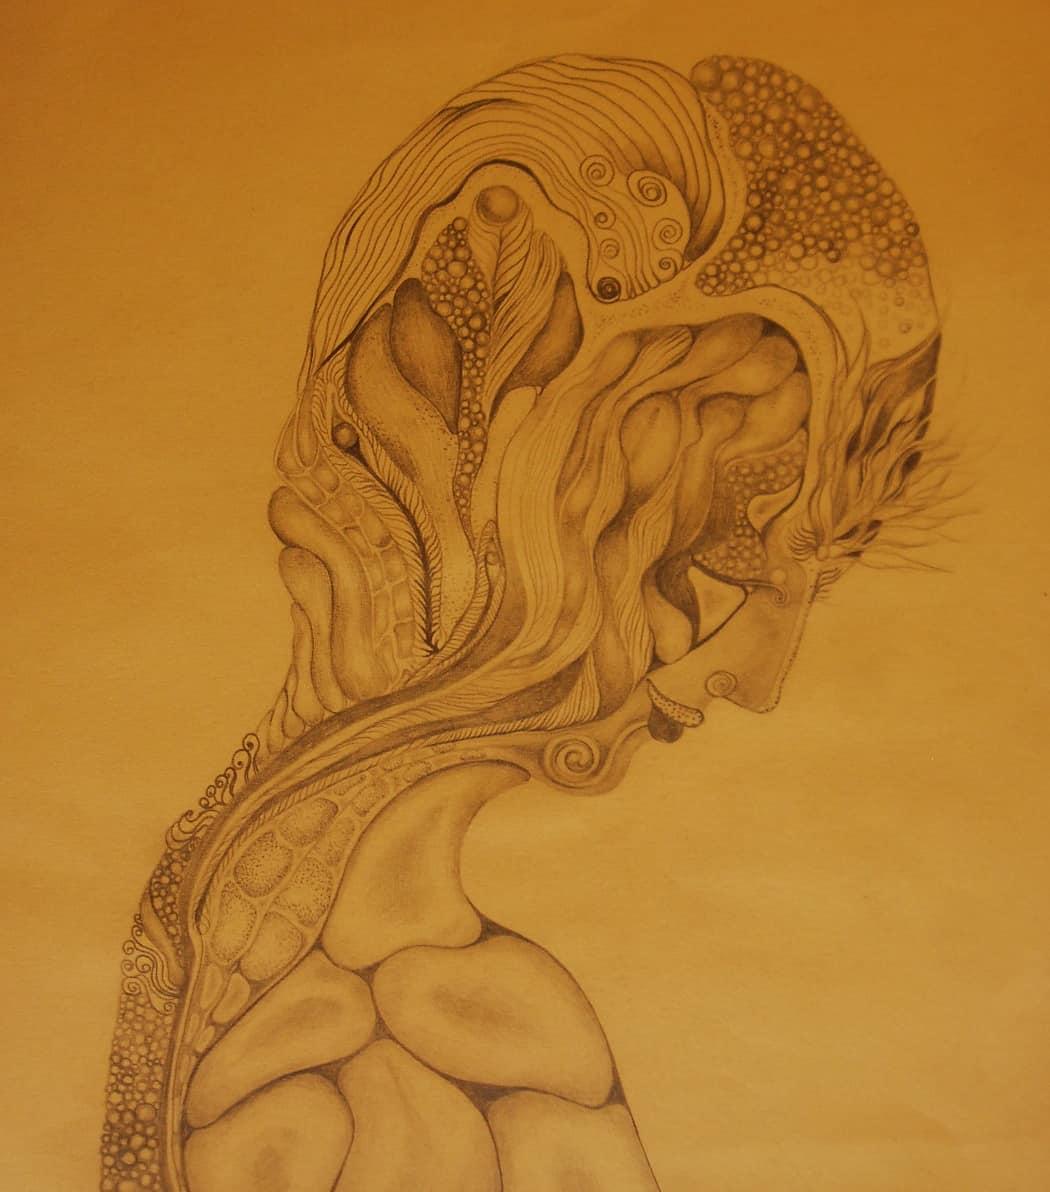 Art by Sofia Badyari